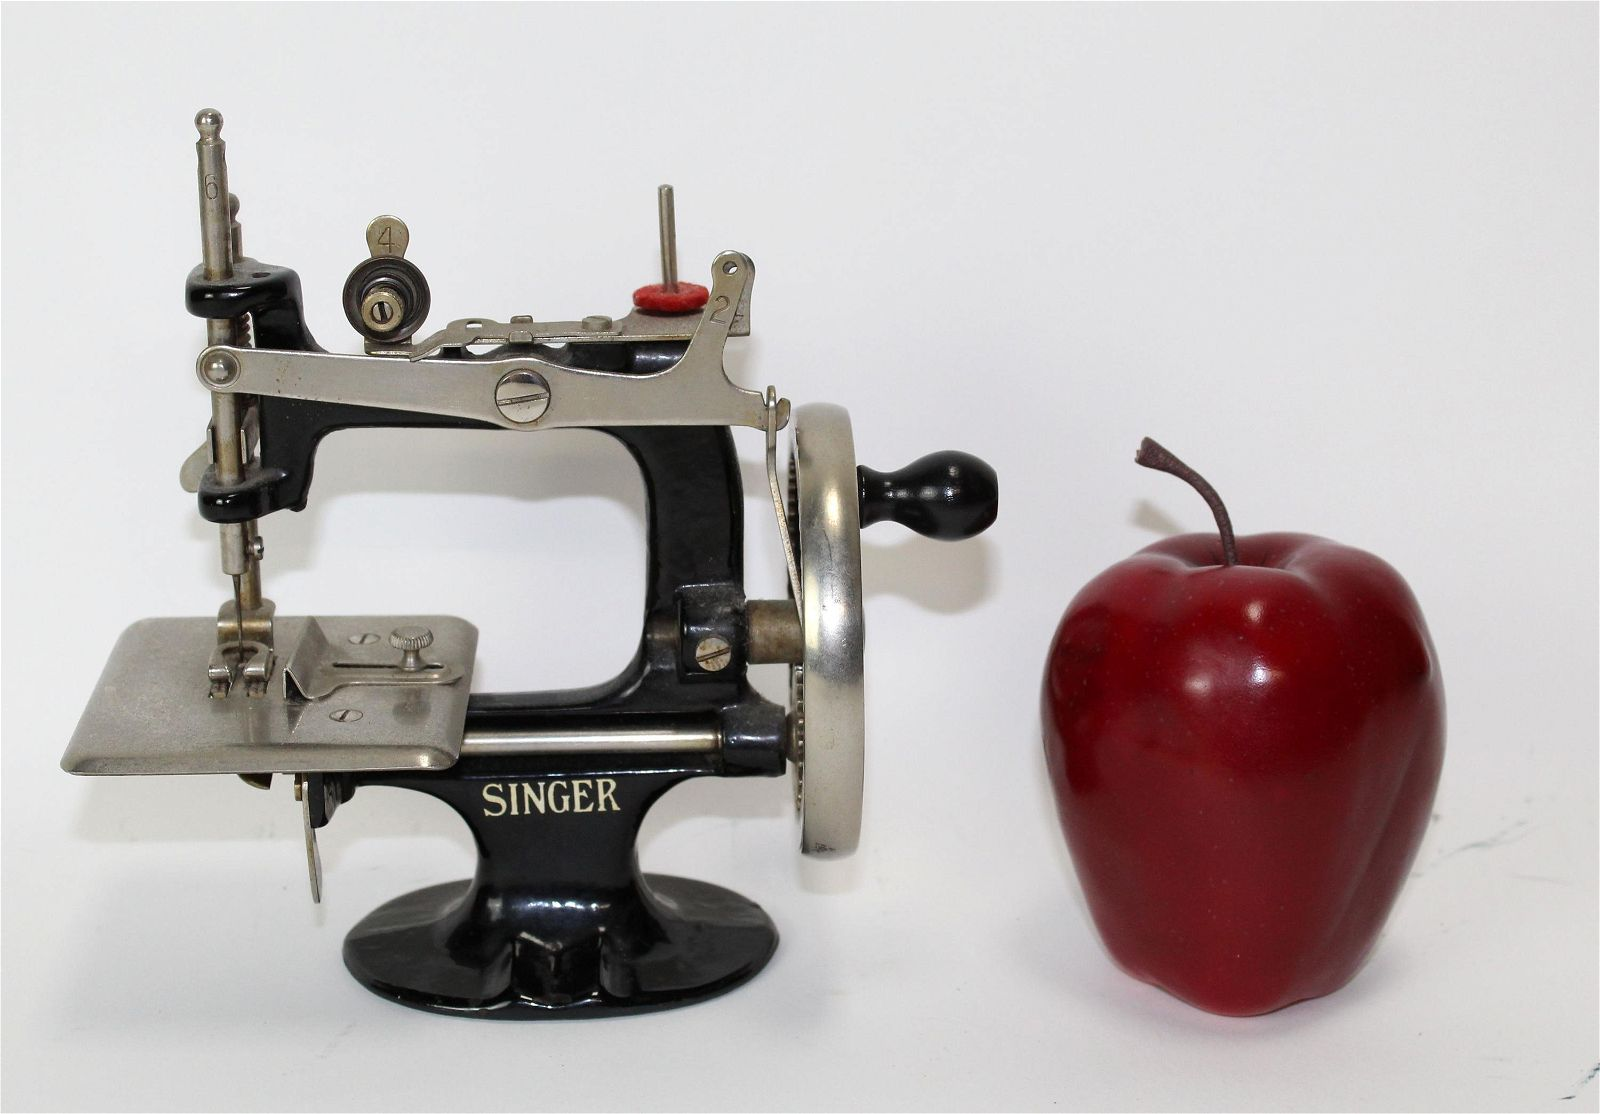 1930's Singer sewing machine salesman sample